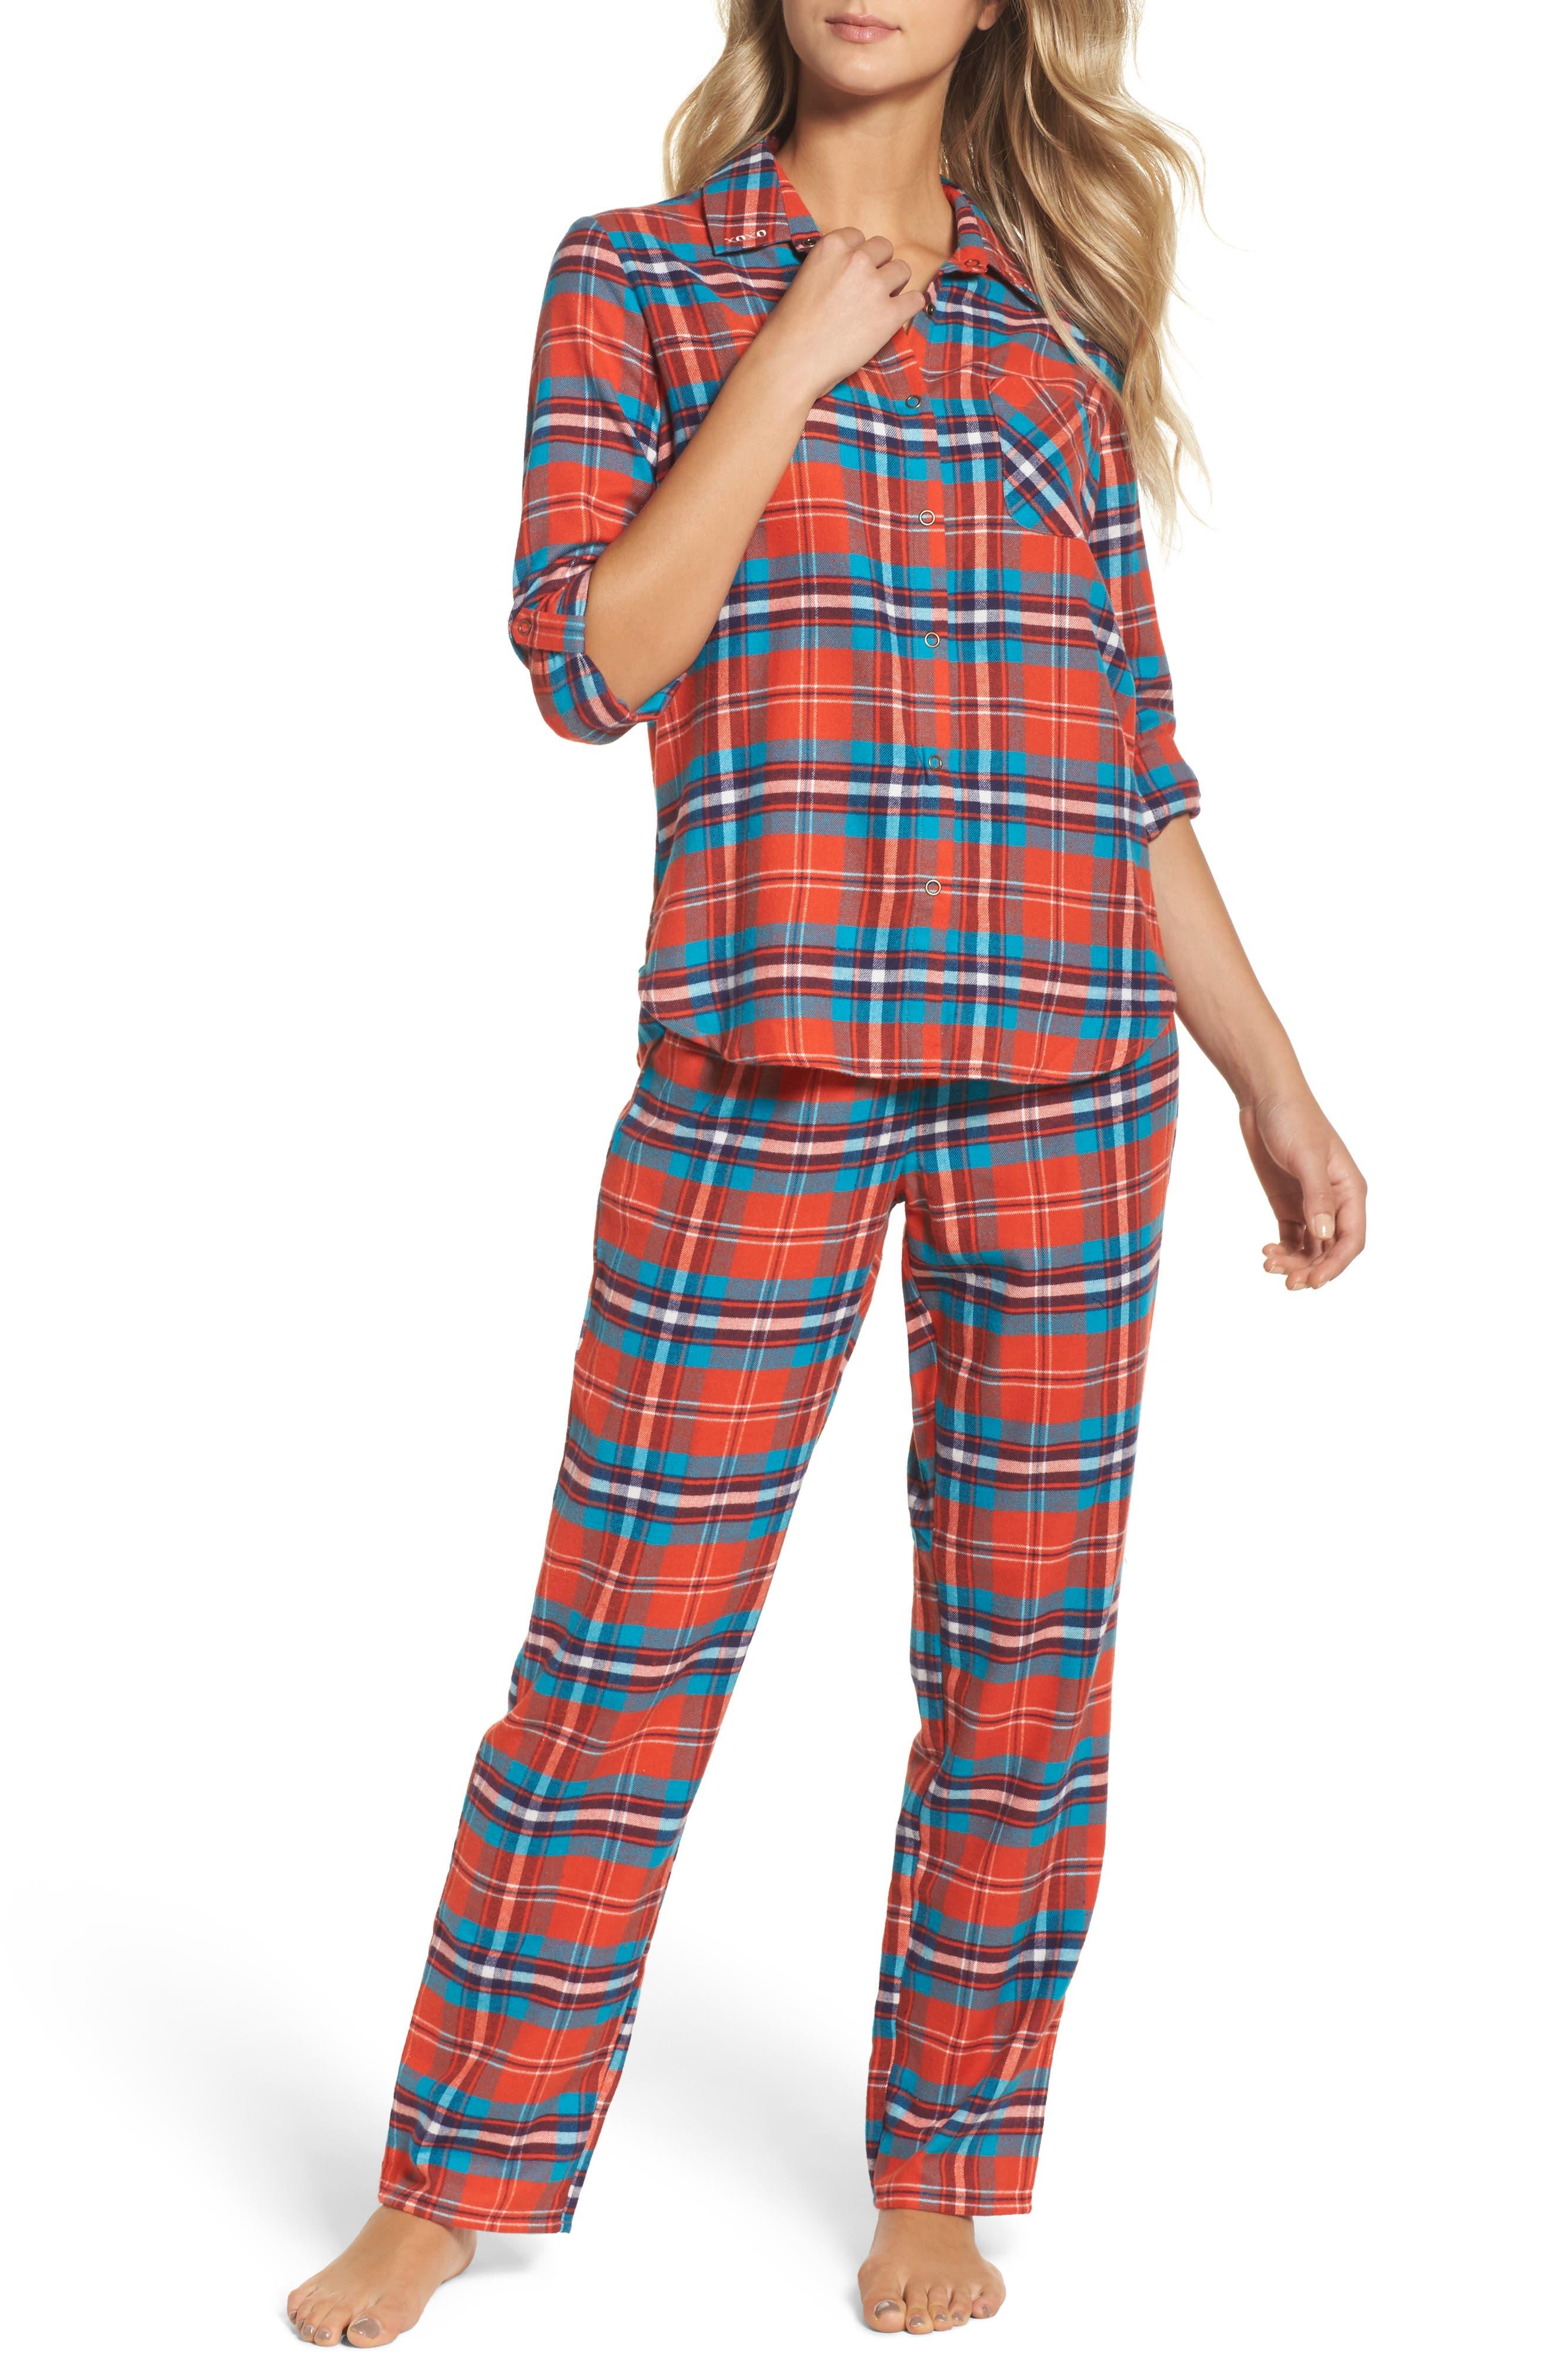 Main Image - Make + Model Flannel Girlfriend Pajamas